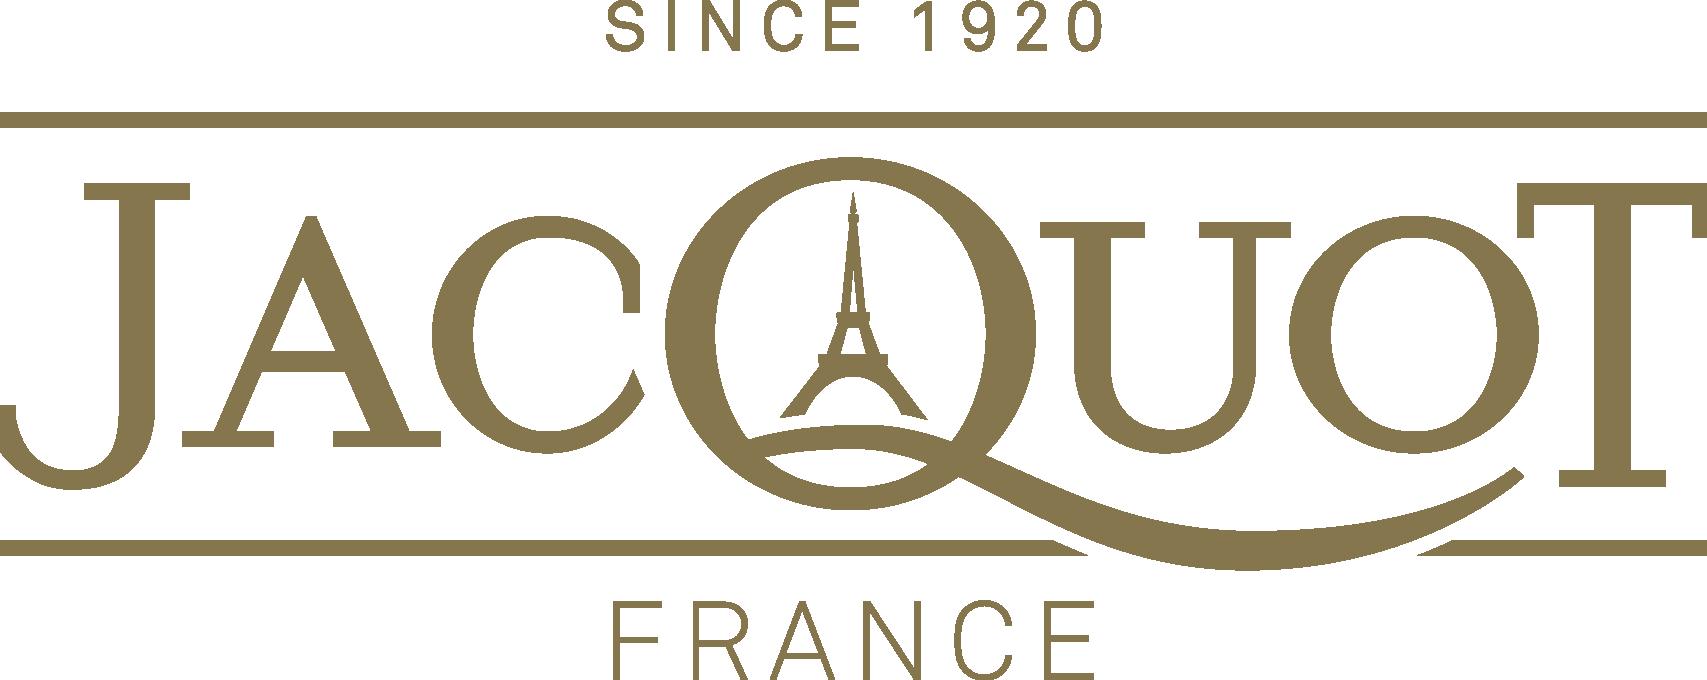 Jacquot Gold Logo Transparent